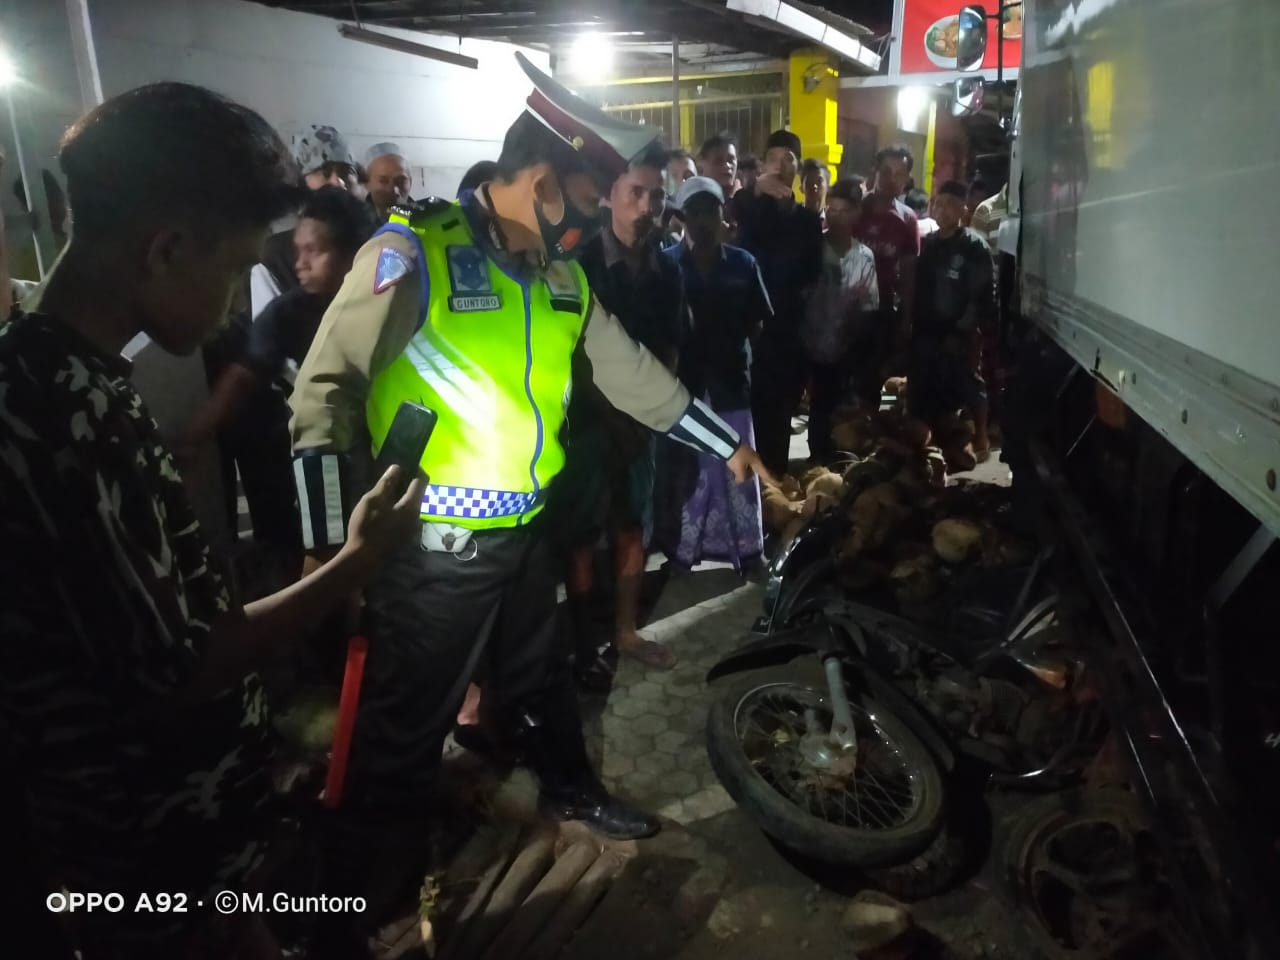 Truk Hilang Kendali Akibatkan 1 Meninggal dan 5 Luka di Ranuyoso